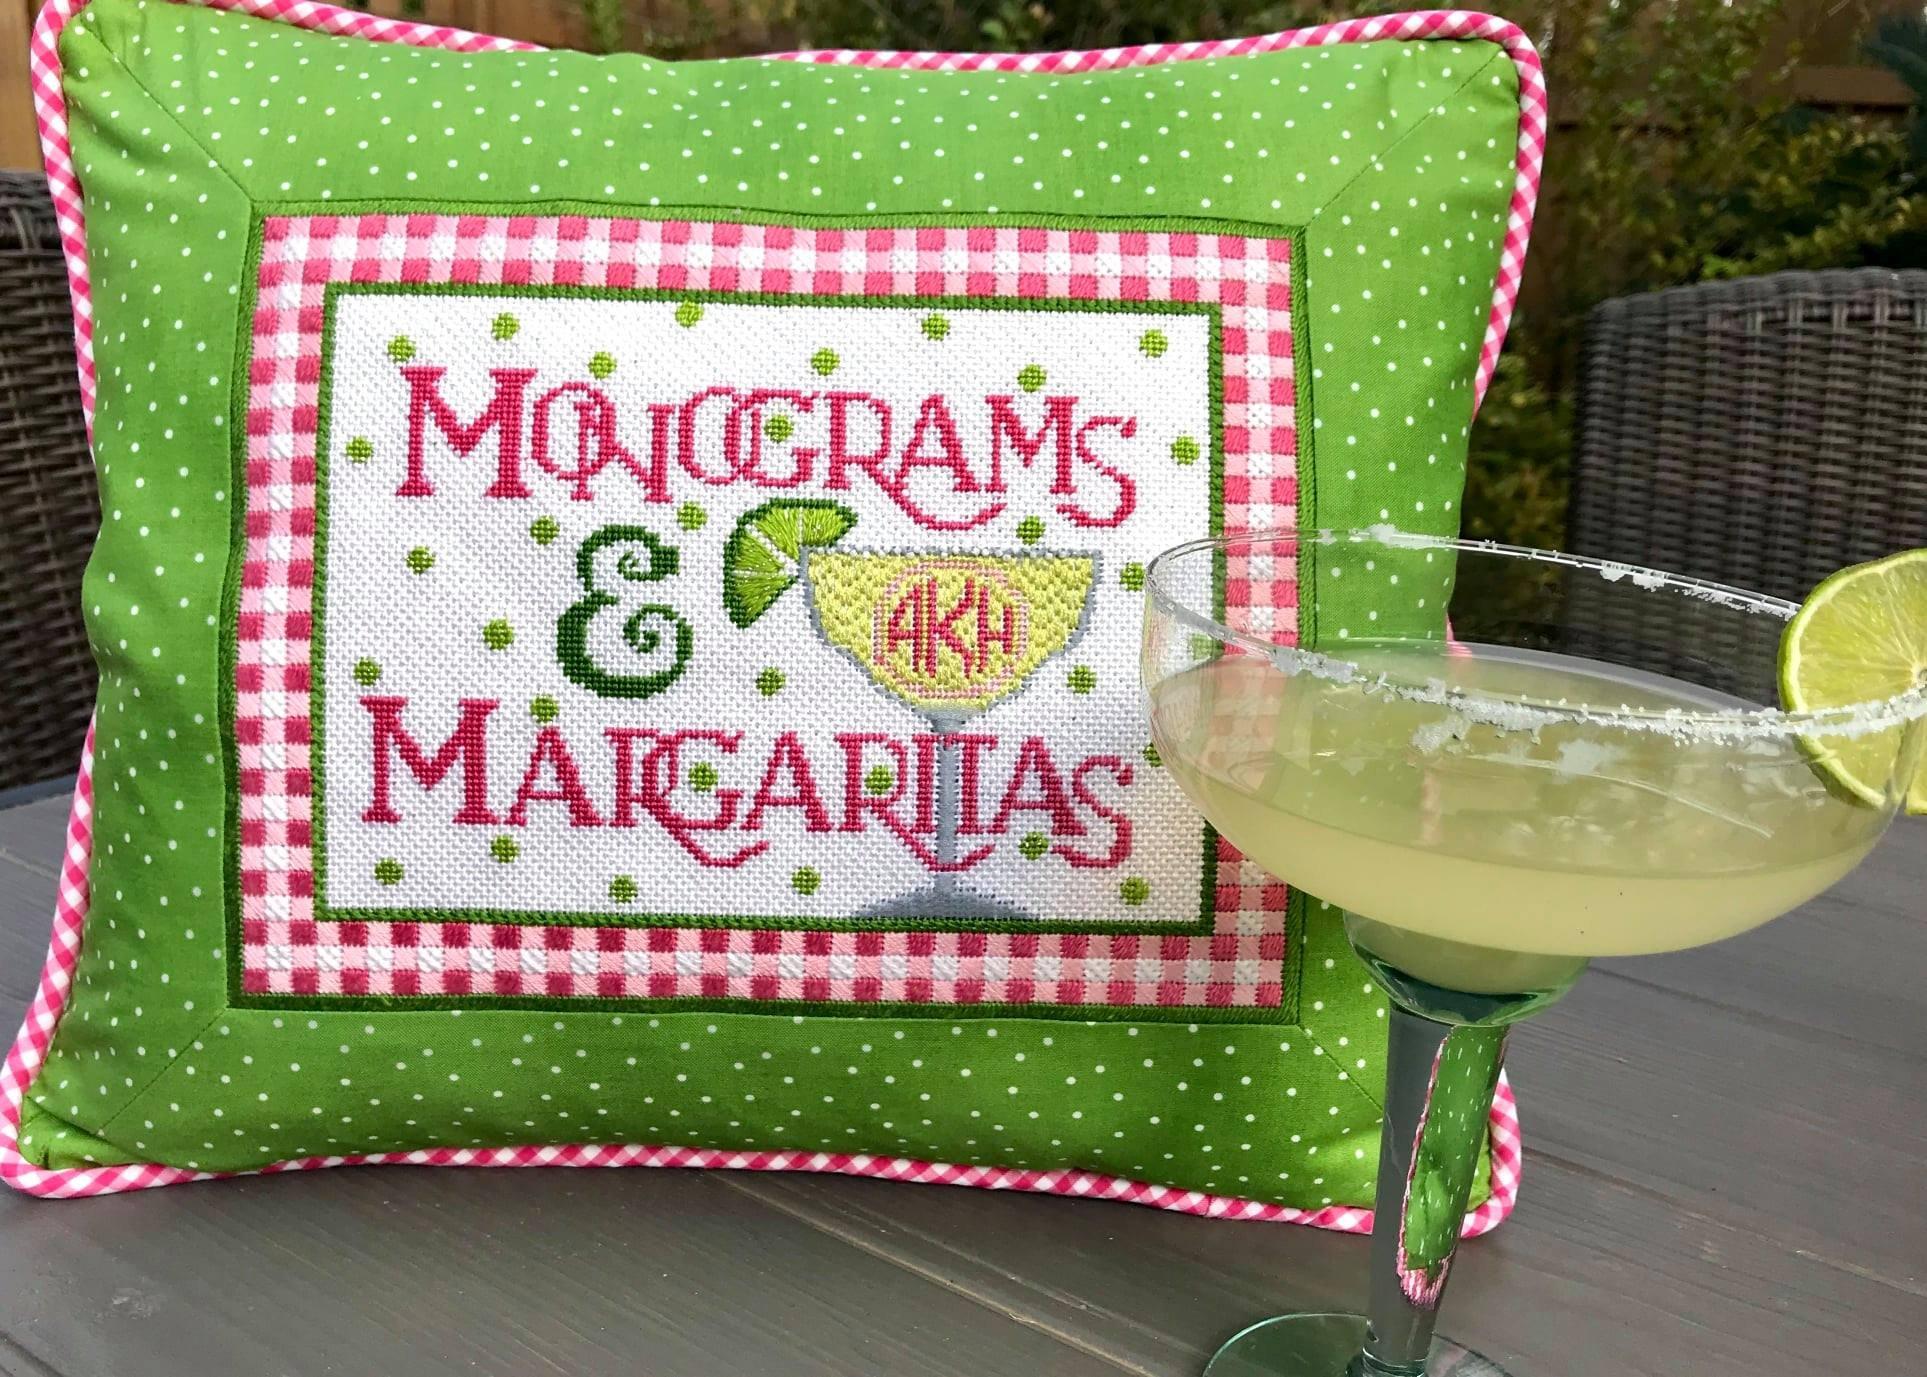 Monograms & Margaritas w/ needle minder